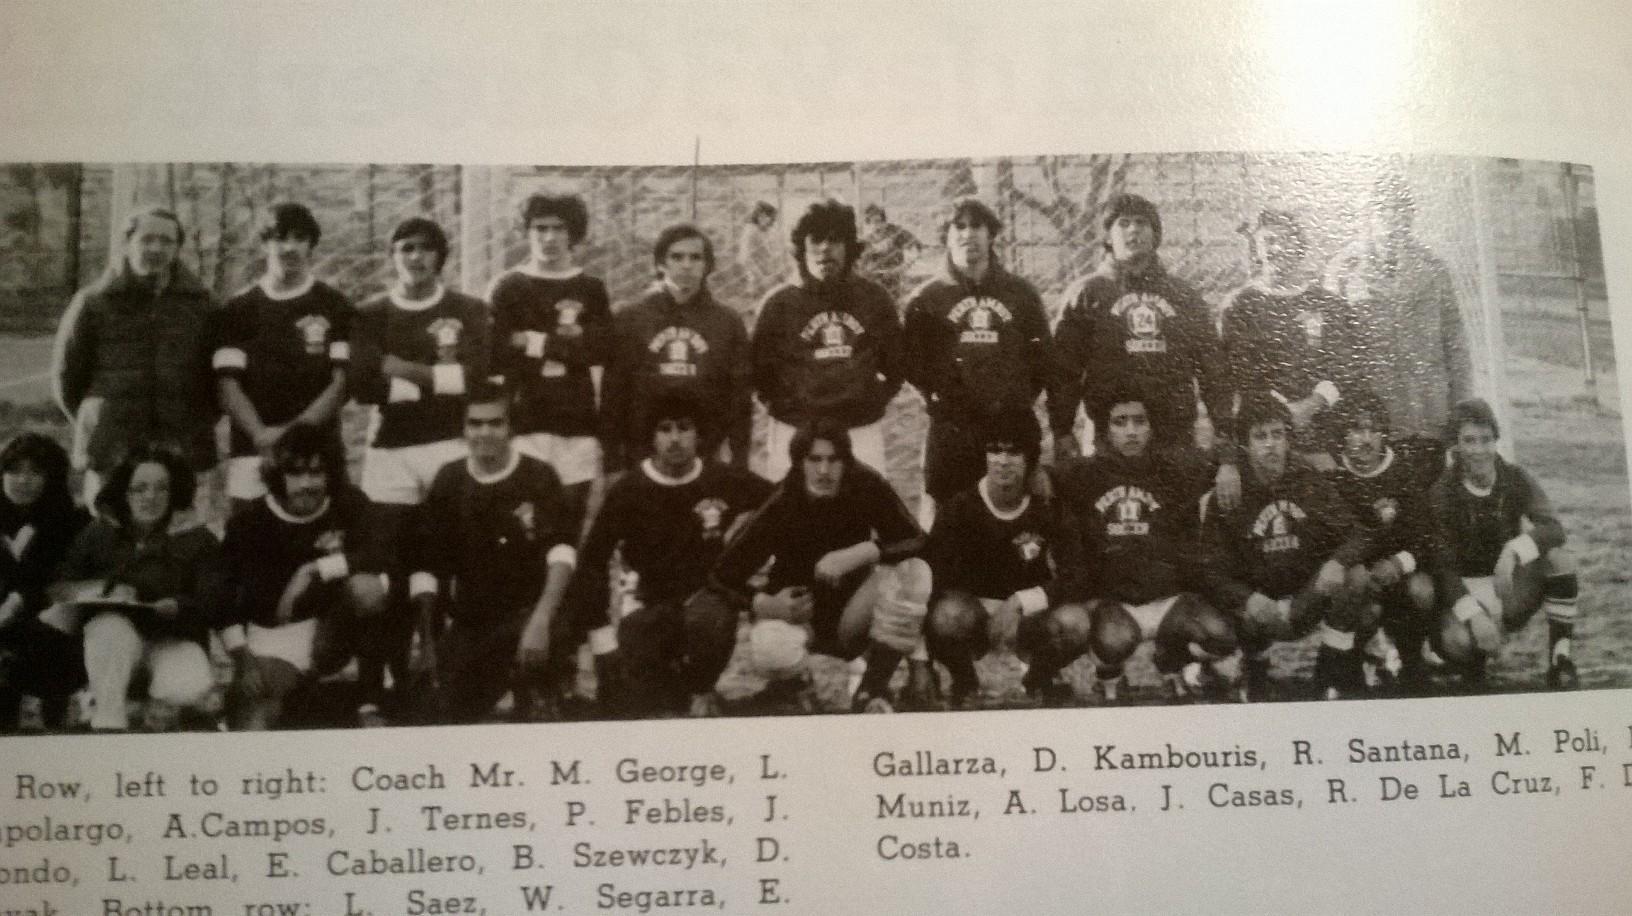 perth amboy soccer team yearbook photo 1977